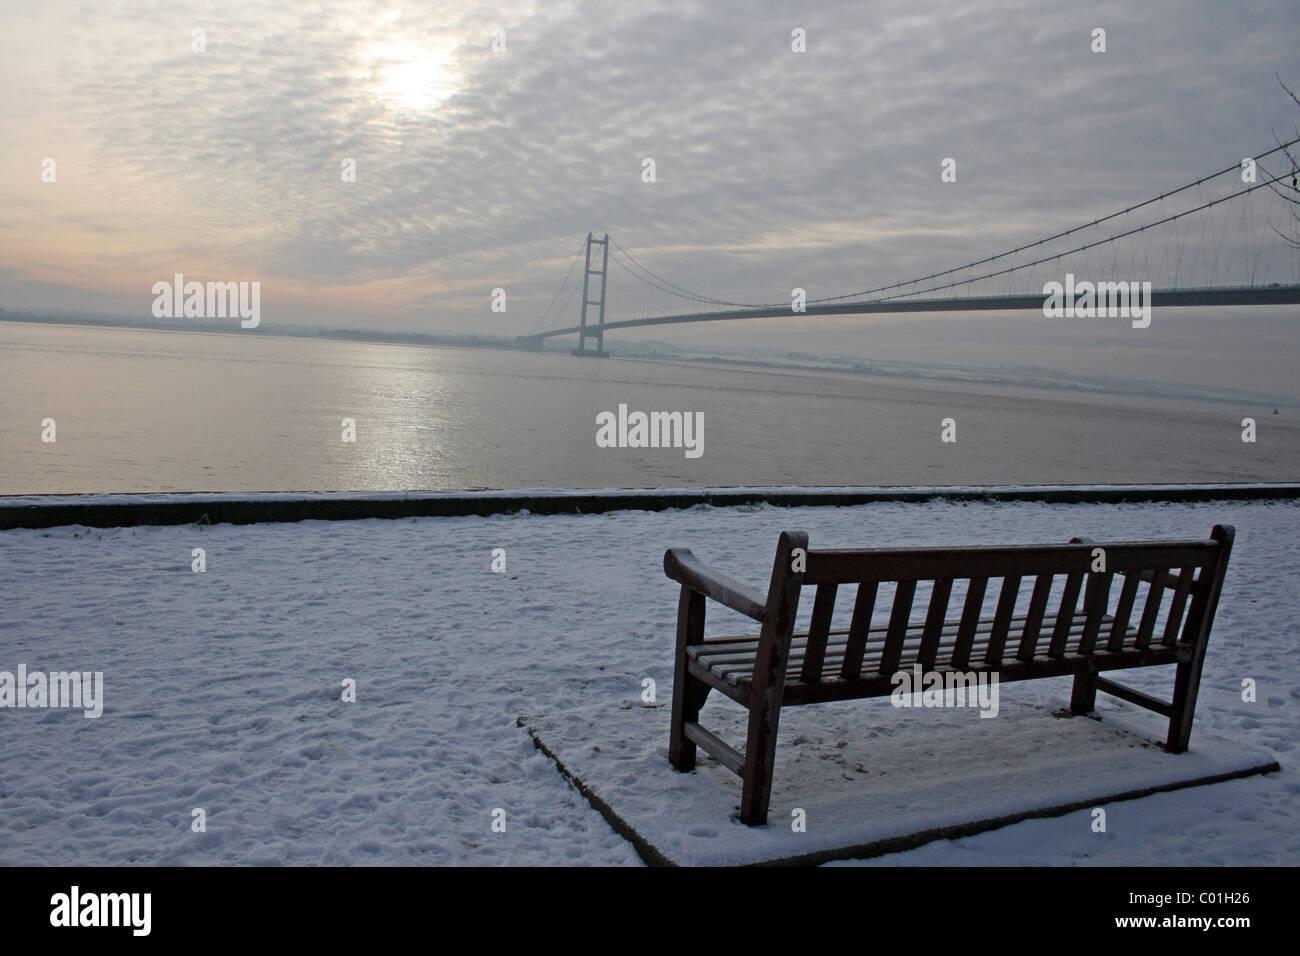 Wintery Scene At The Humber Bridge, Yorkshire, UK - Stock Image